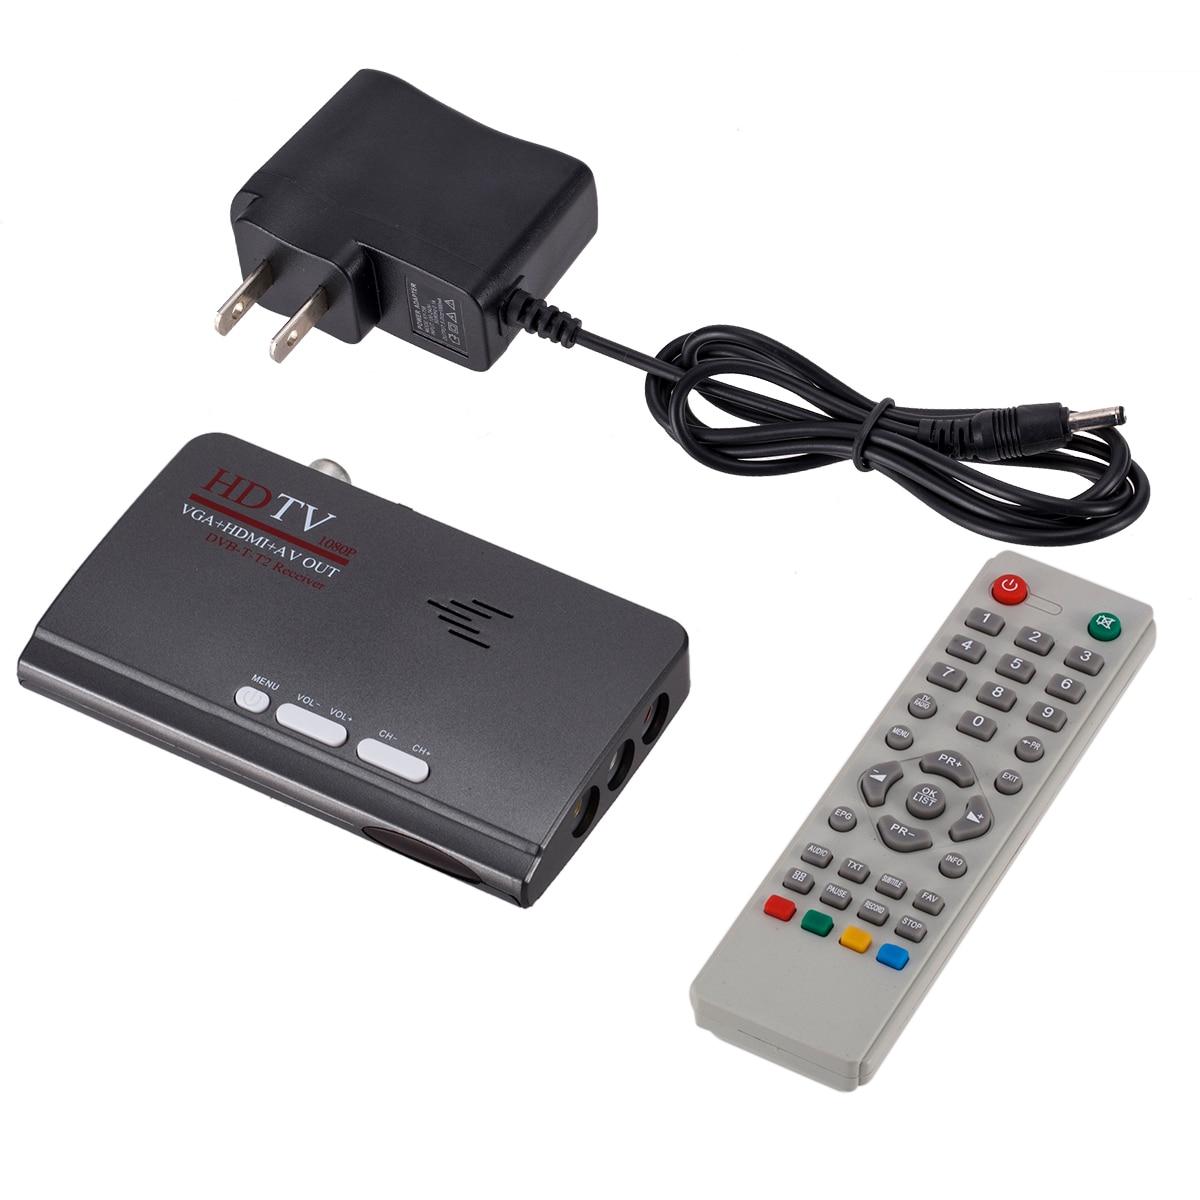 DVB-T DVB-T2 TV Tuner Receiver DVB T/T2 TV Box VGA AV CVBS 1080P HDMI digital HD Satellite receiver With Remote Control